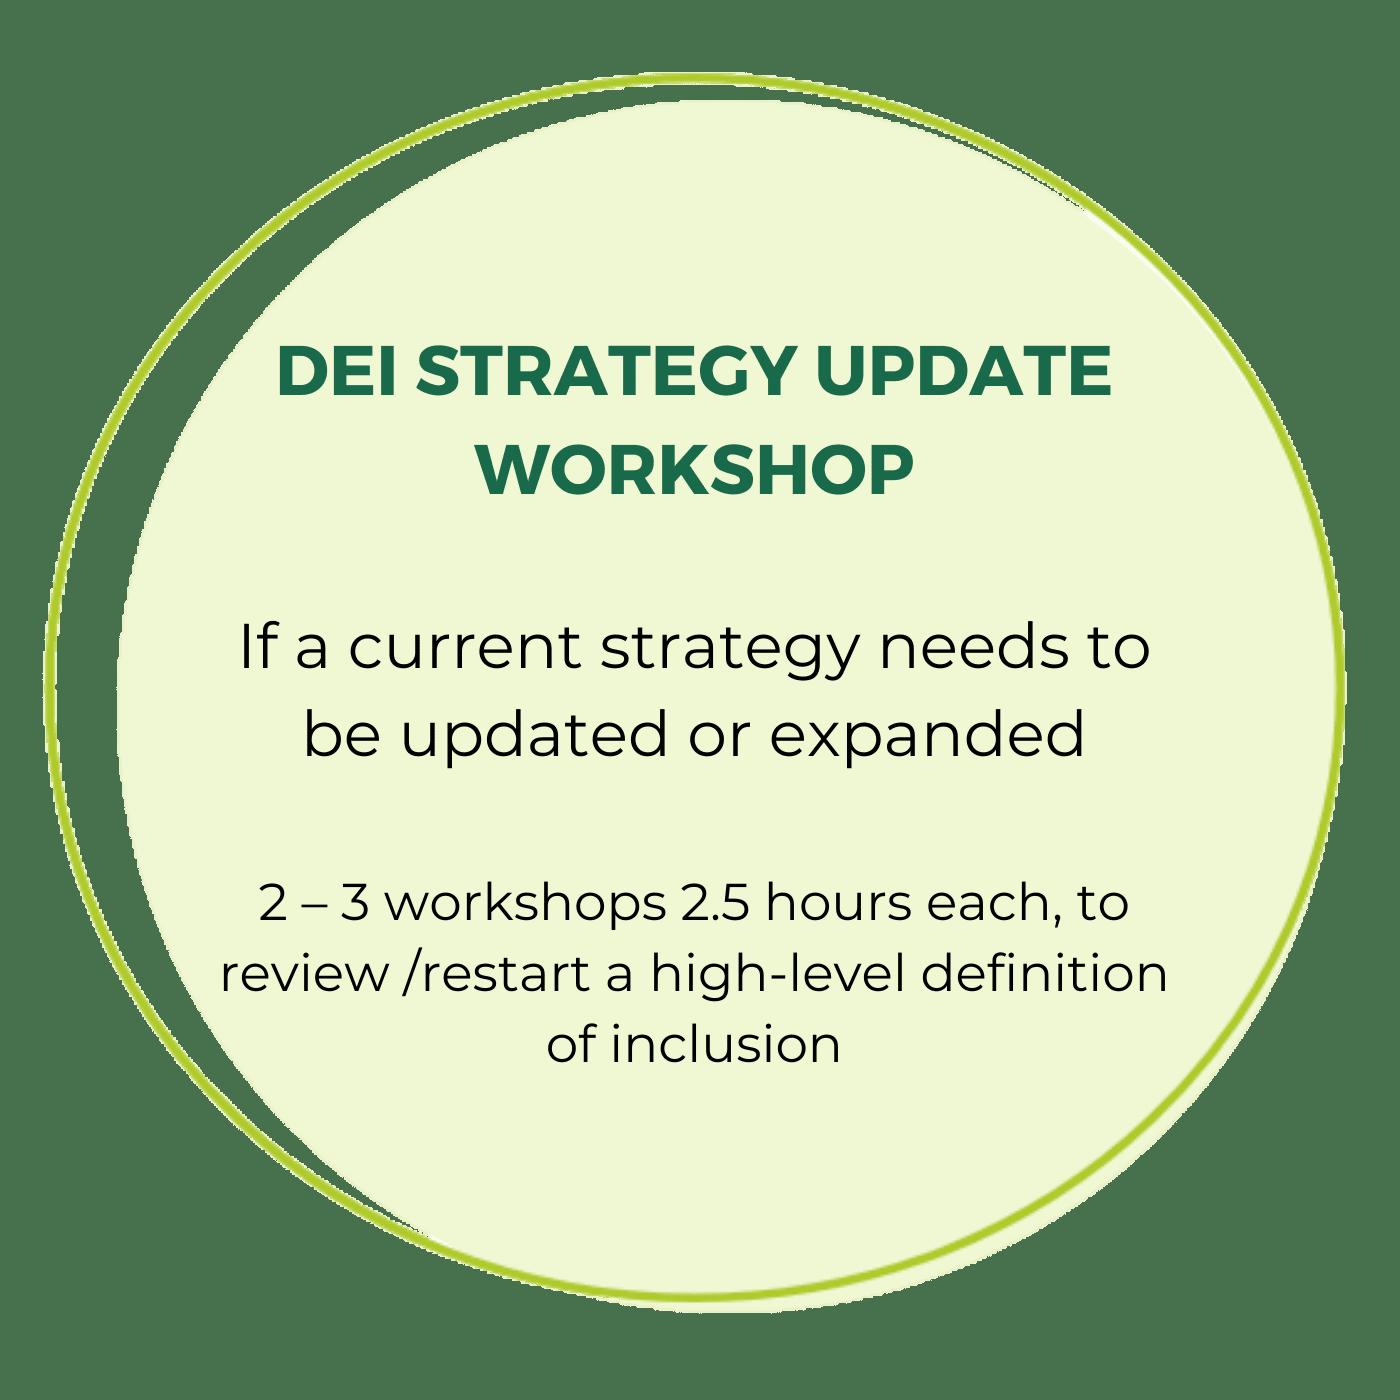 DEI strategy update workshop 1